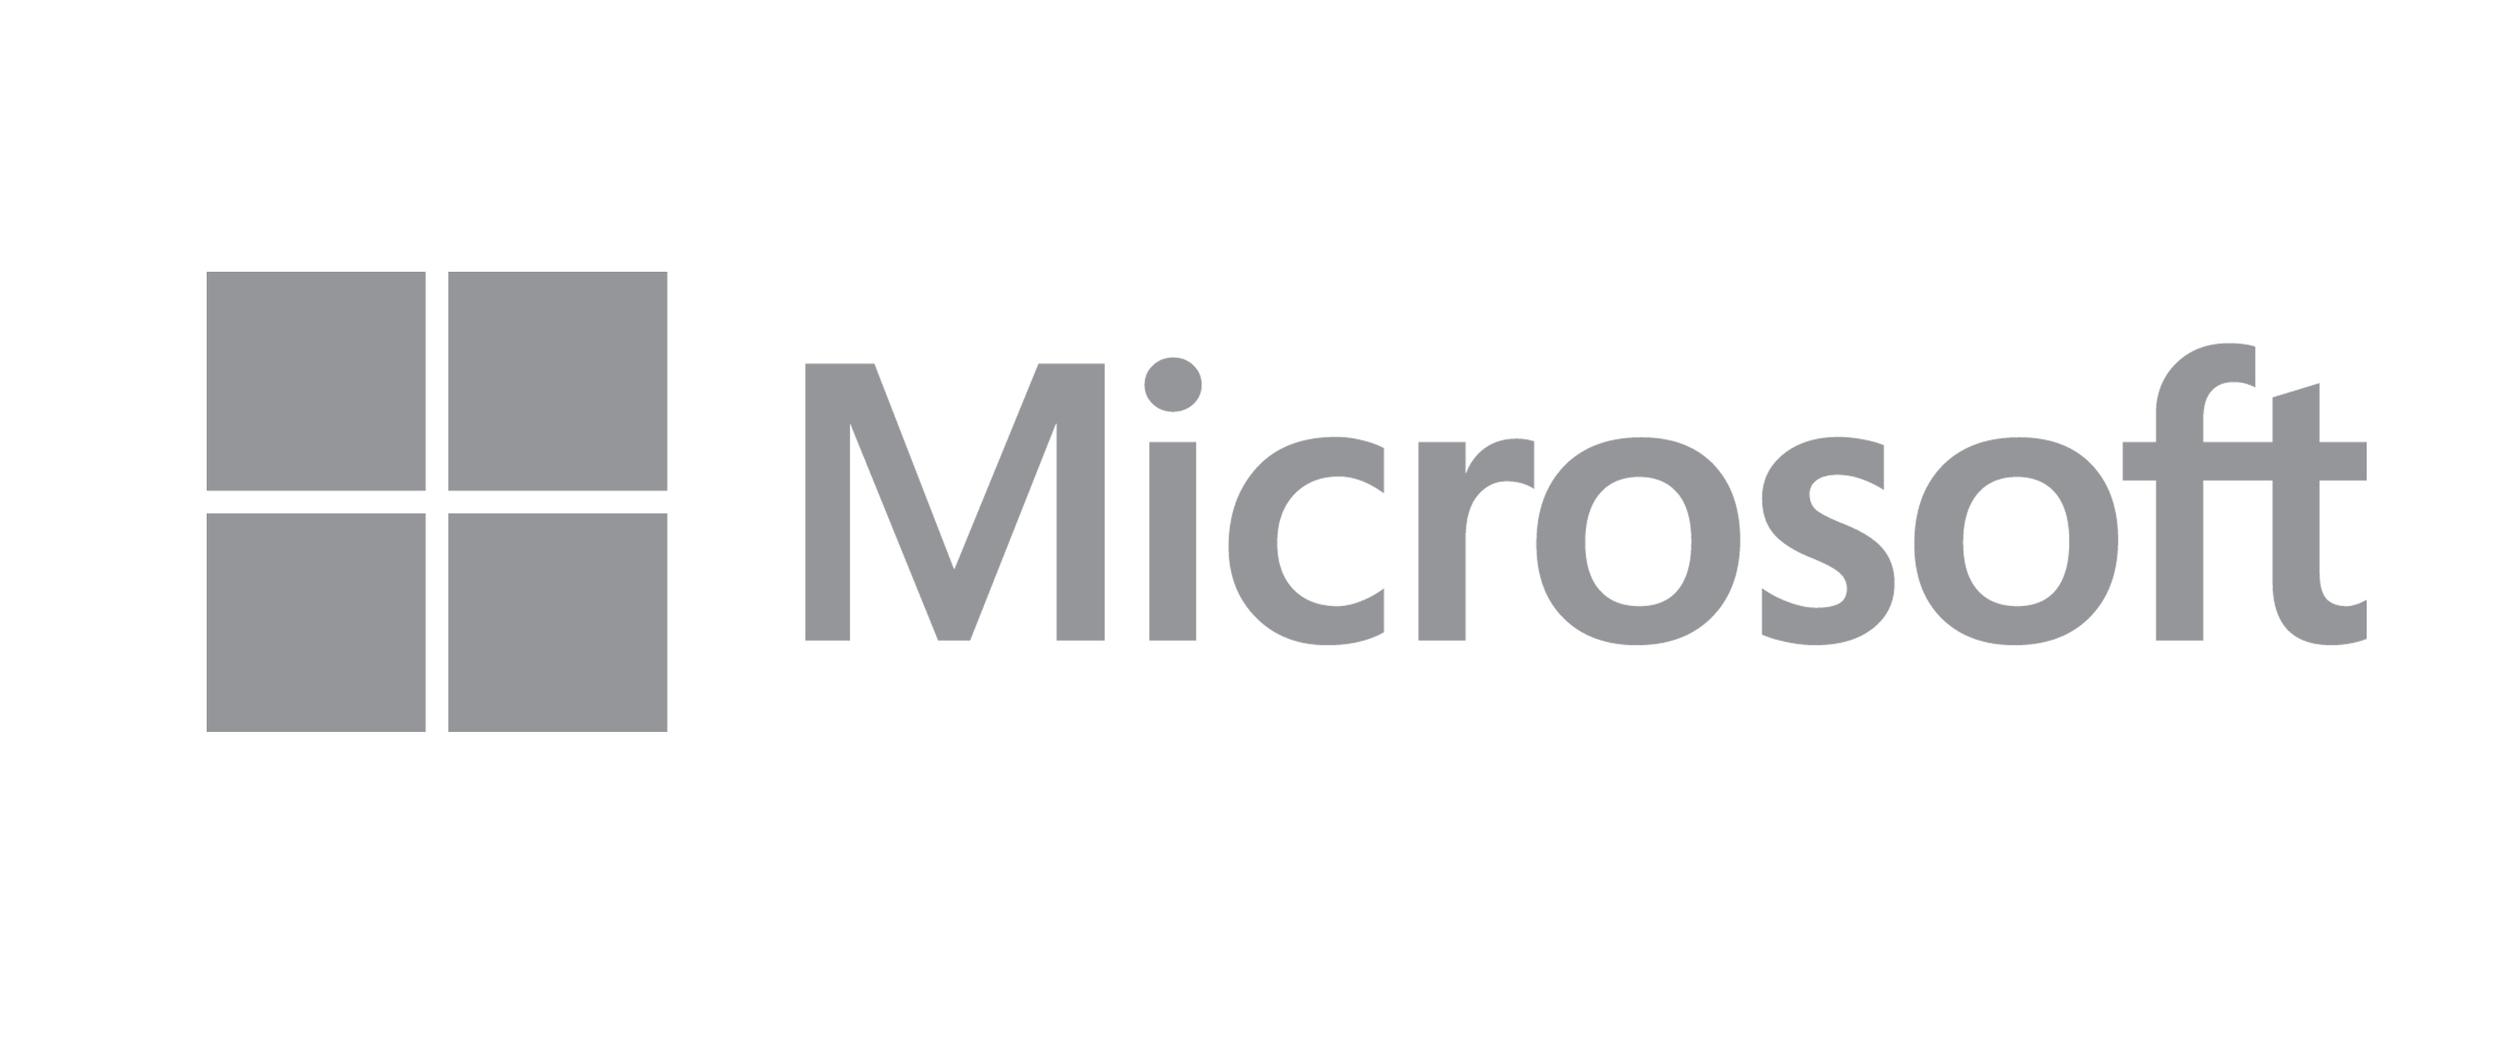 Microsoft Logo_Gray.jpg